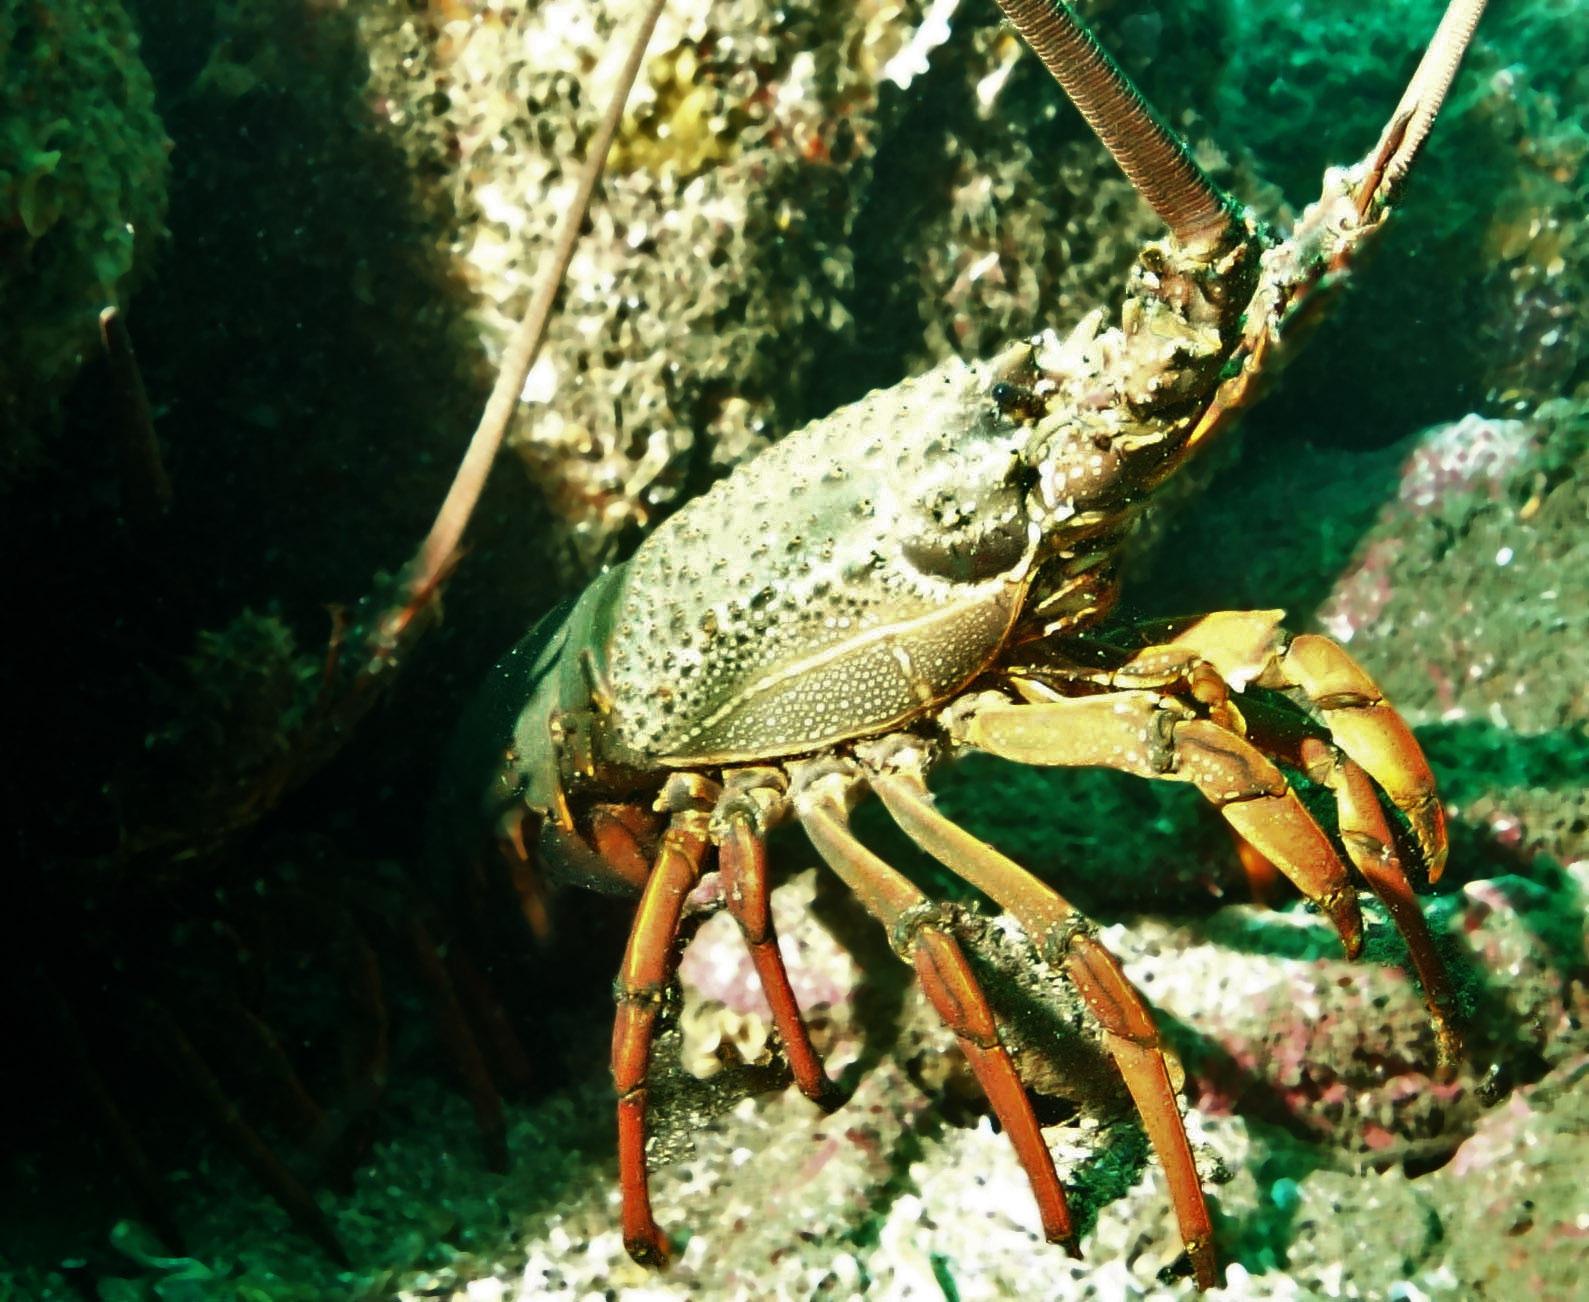 Image of green rock lobster